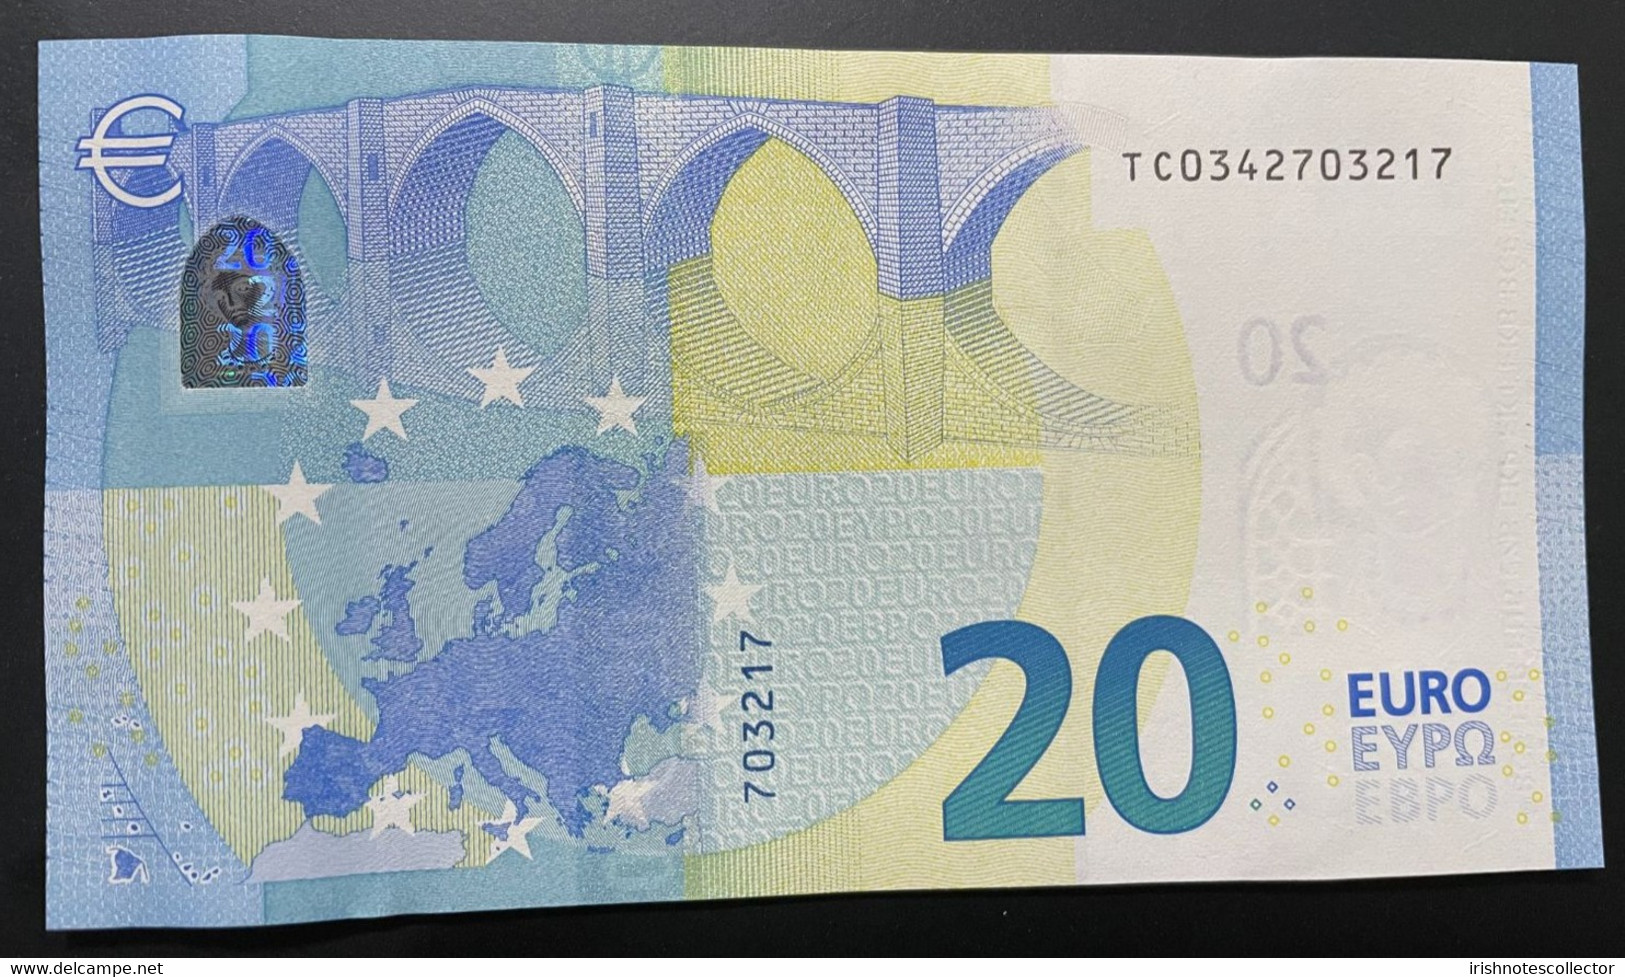 Rare Printecode T008B4 UNC € 20 Euro Draghi Ireland European Union 2015 Irlanda - 20 Euro